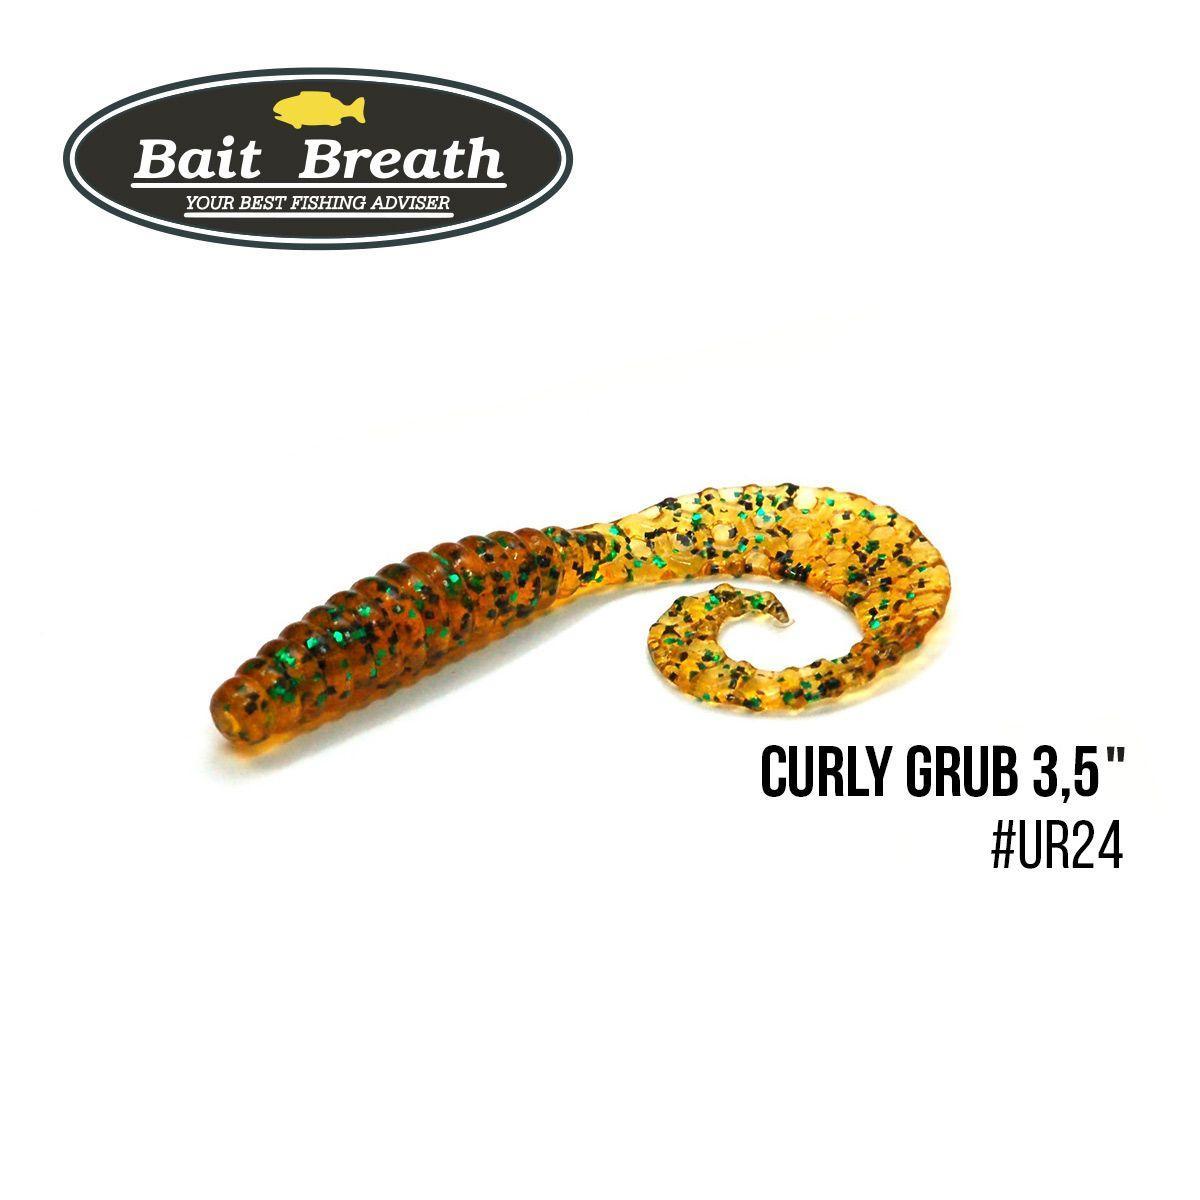 """.Приманка Bait Breath Curly Grub 3,5"" (10шт) (Ur24 Pumpkin/green*seed)"